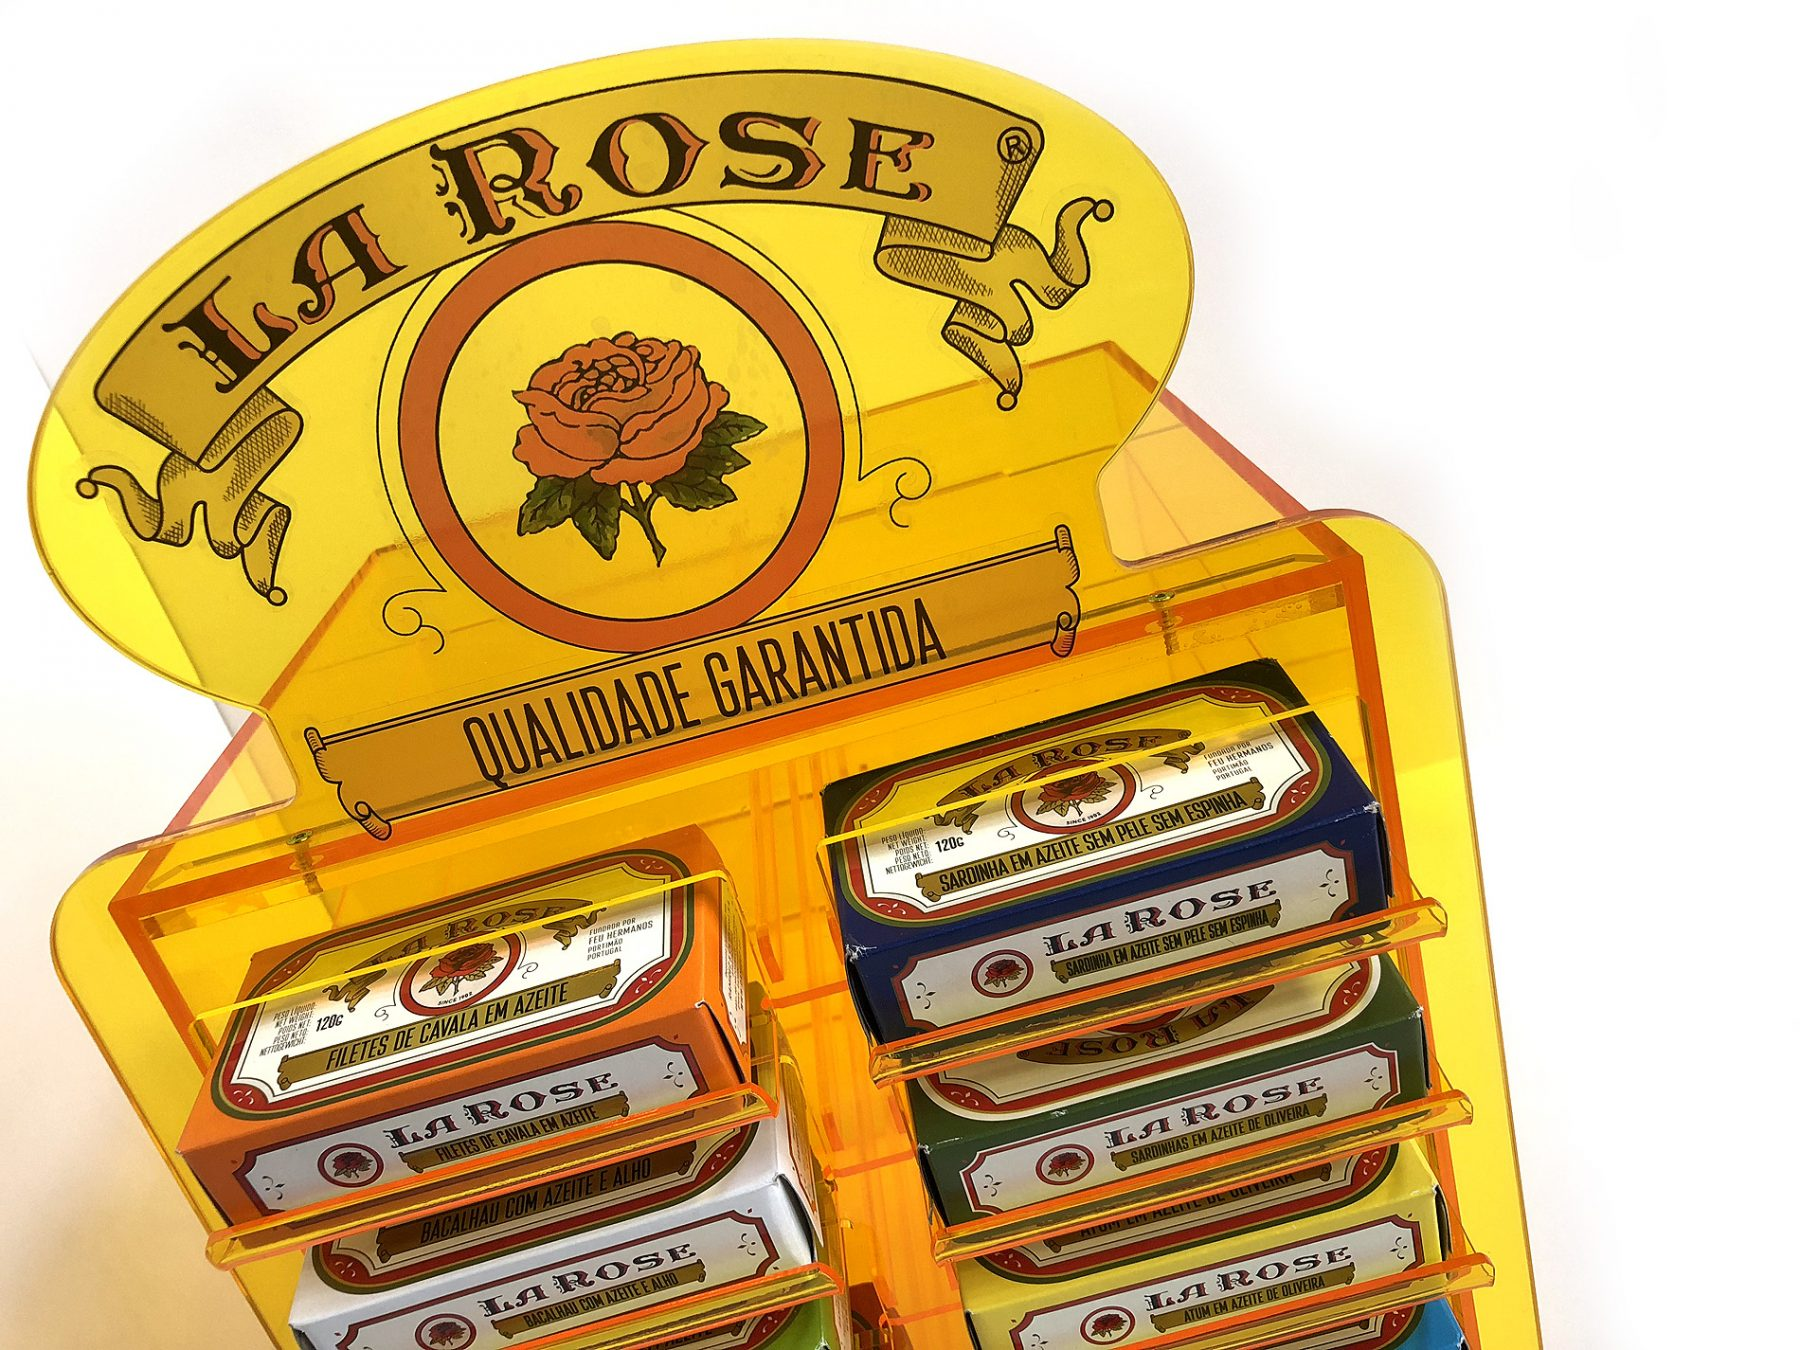 Expositor La Rose